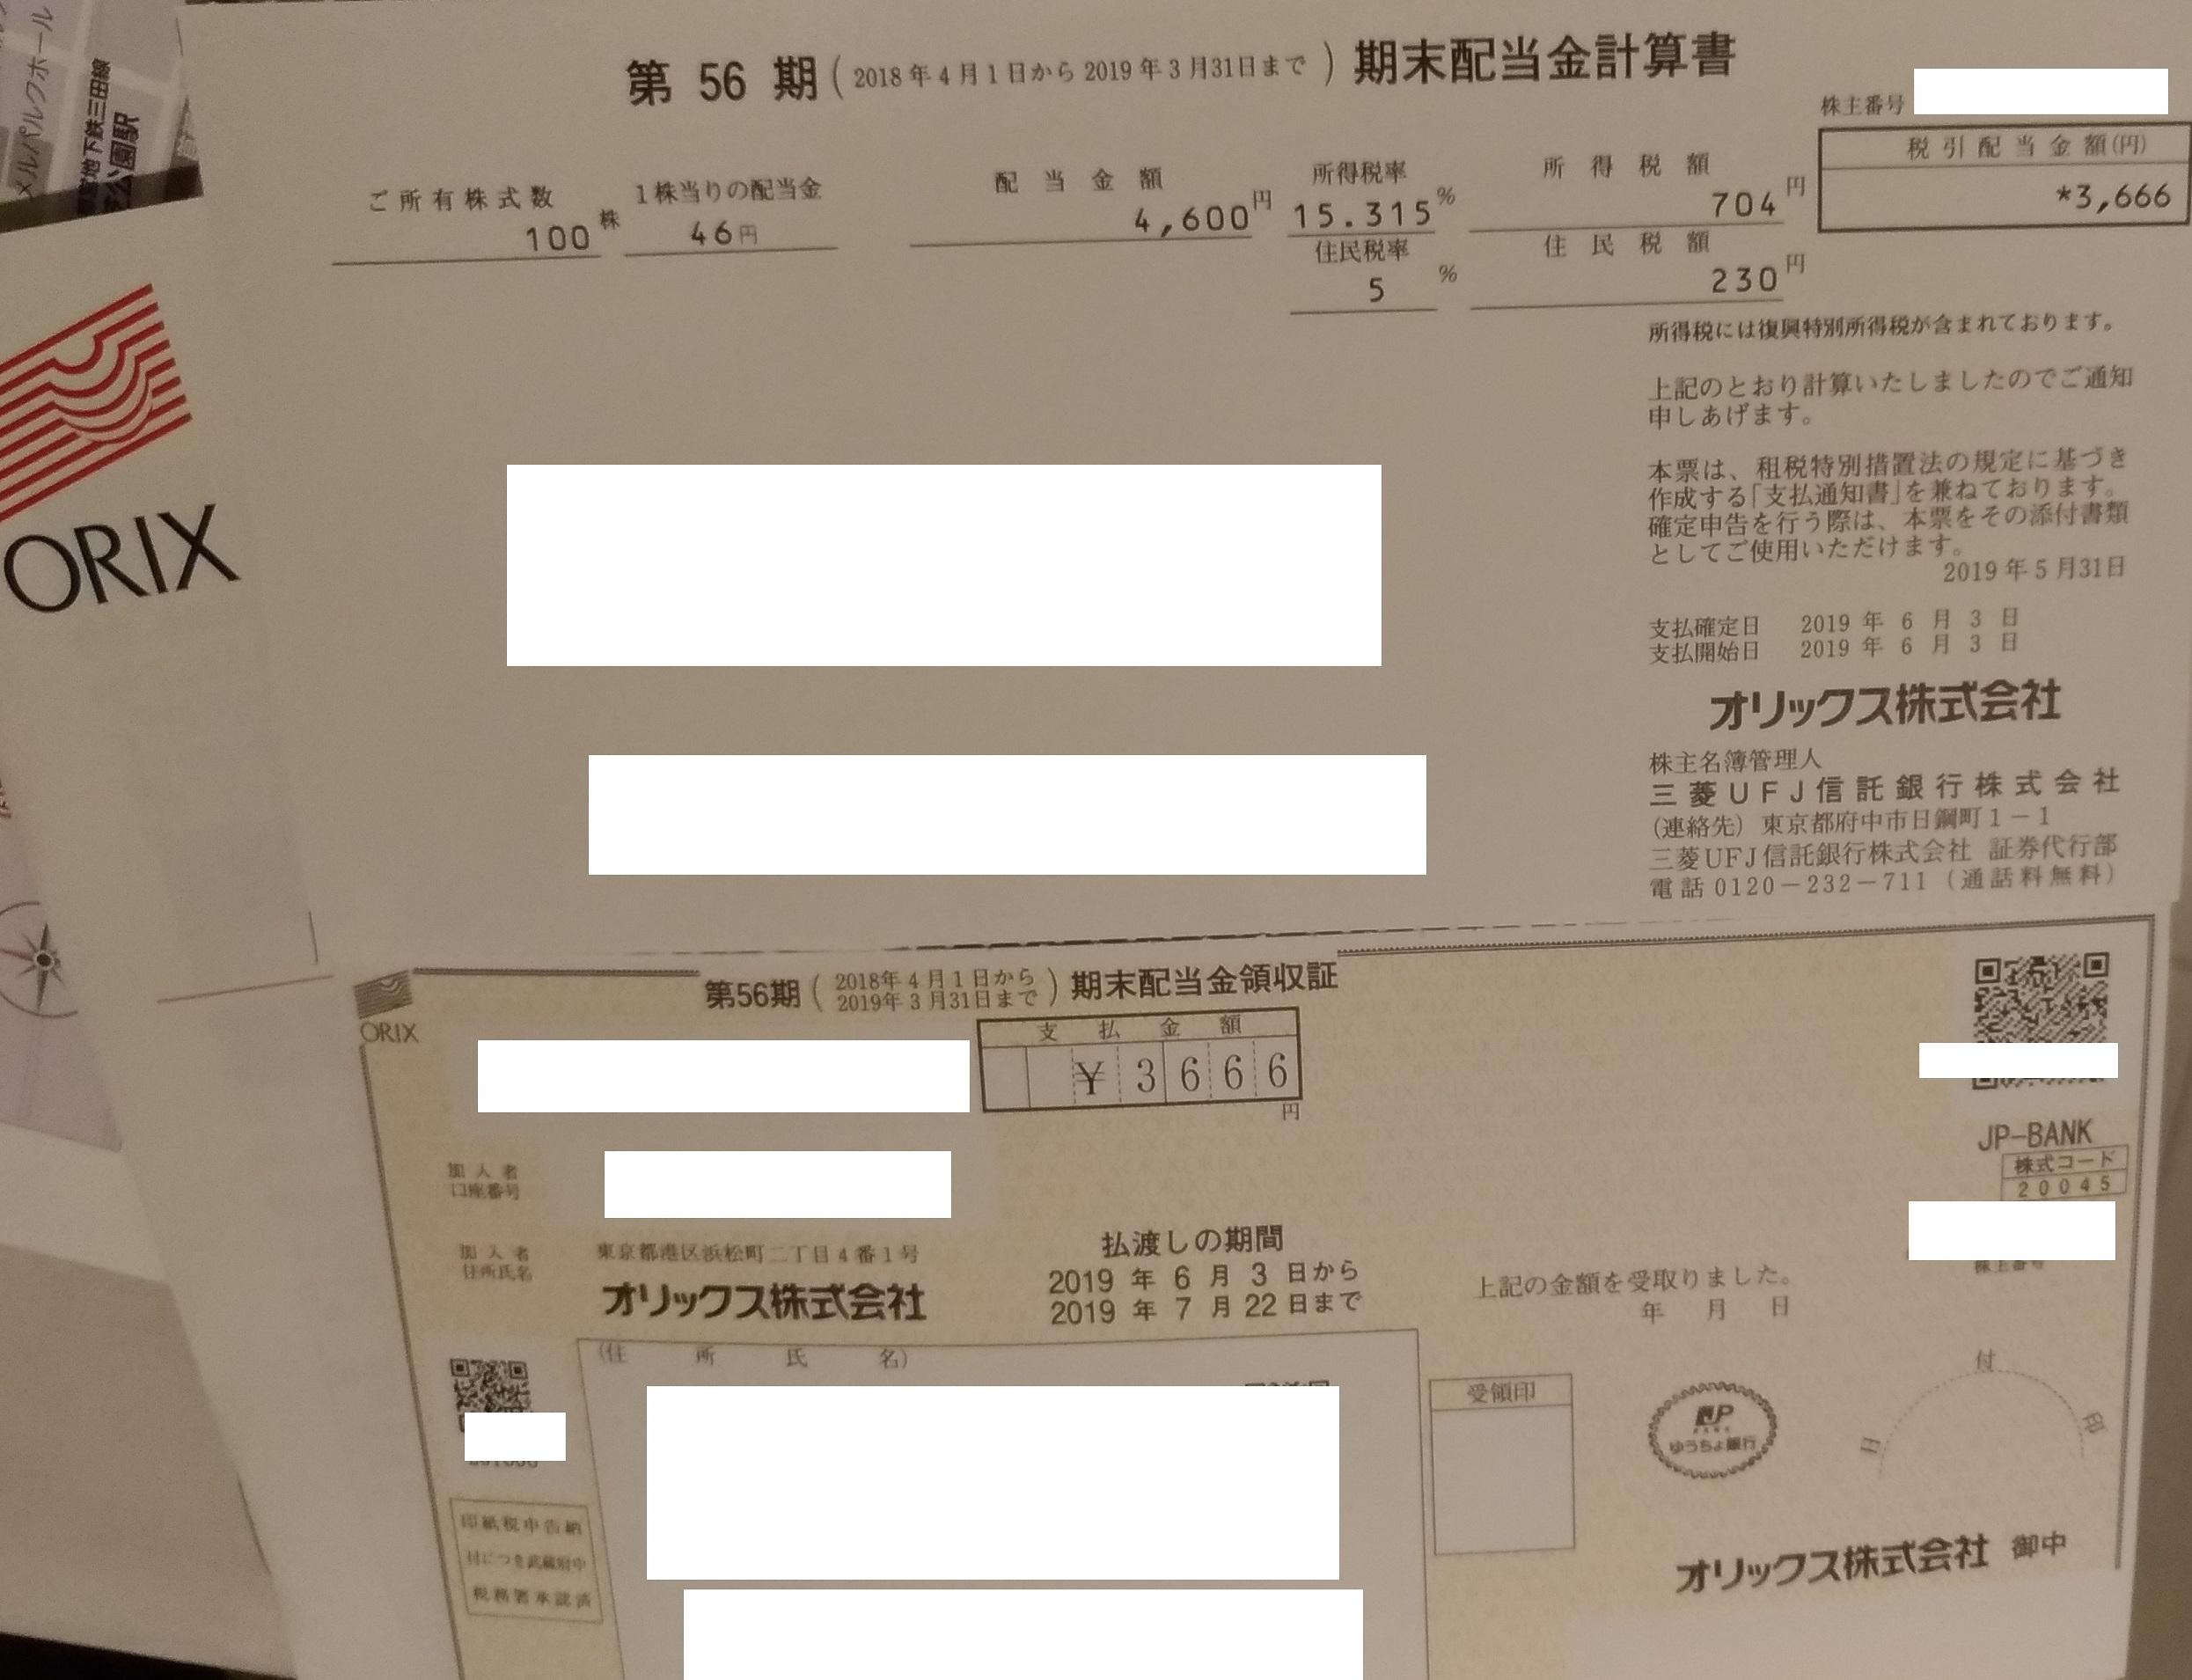 orix_haito_20190603_.jpg